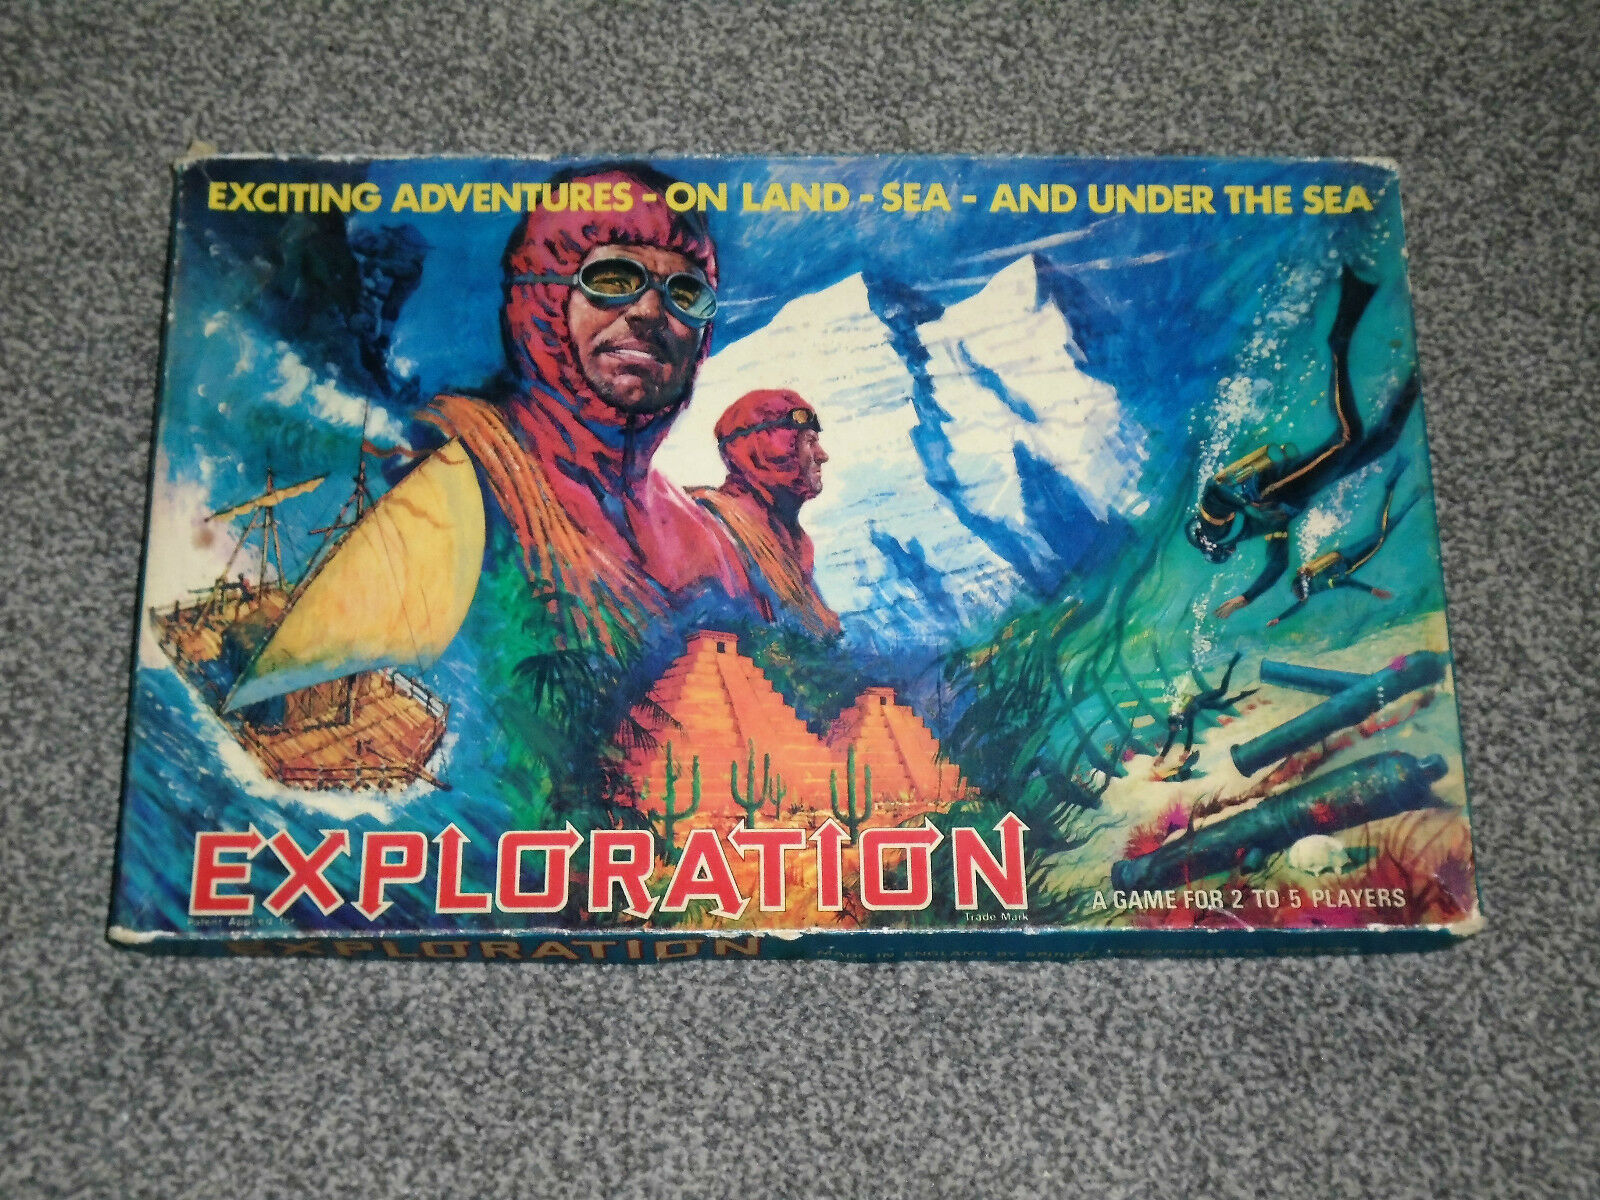 EXPLORATION GAME   RARE 1967 VINTAGE SPRING ENTERPRISES EDITION VGC(FREE UK P&P)